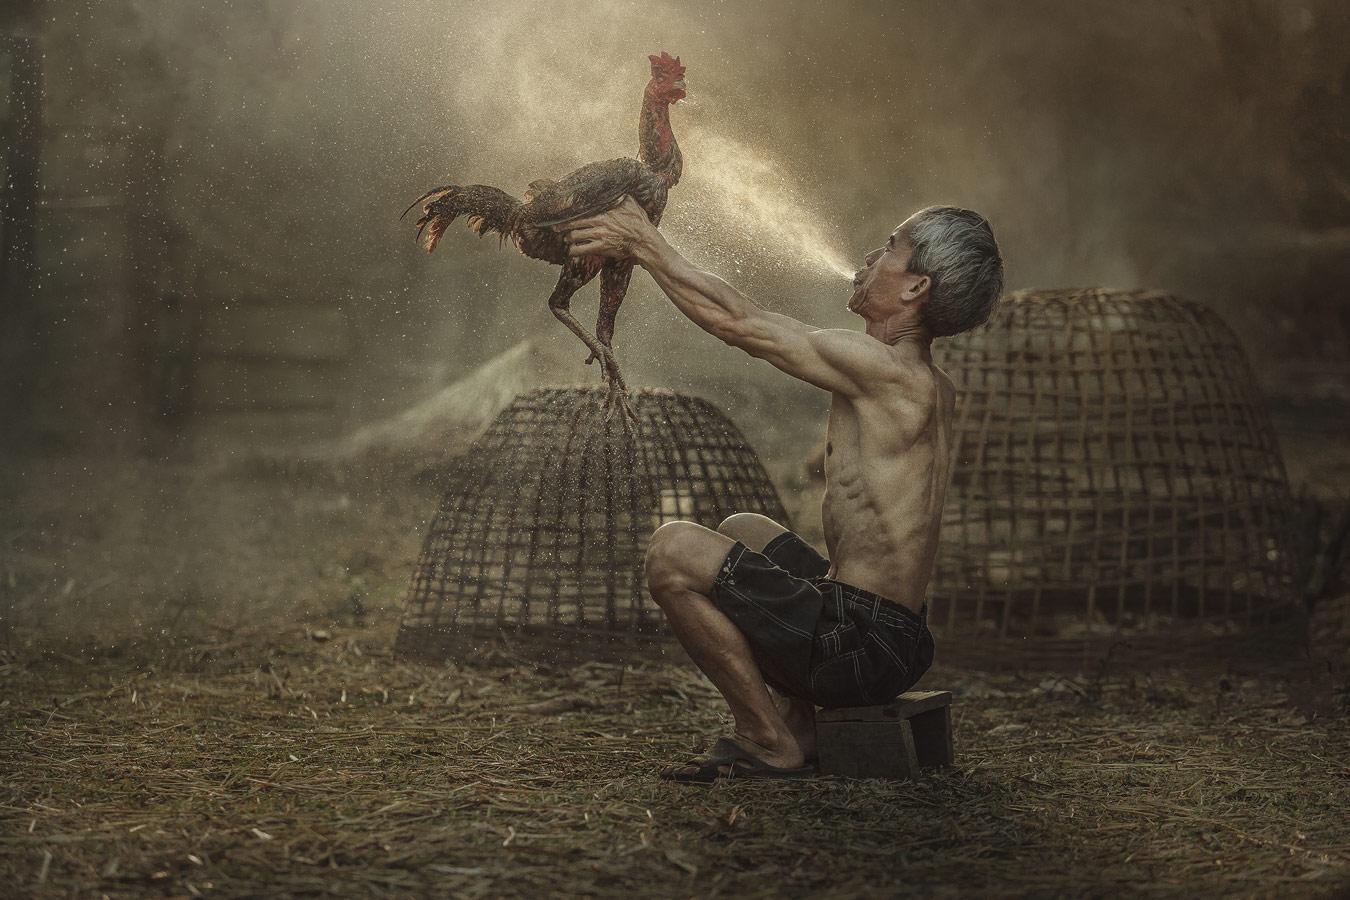 Man cleaning Thai gamecock, © Jakkree Thampitakkull, Thailand, Portrait Nomination, 2 place, 35AWARDS Photo Contest